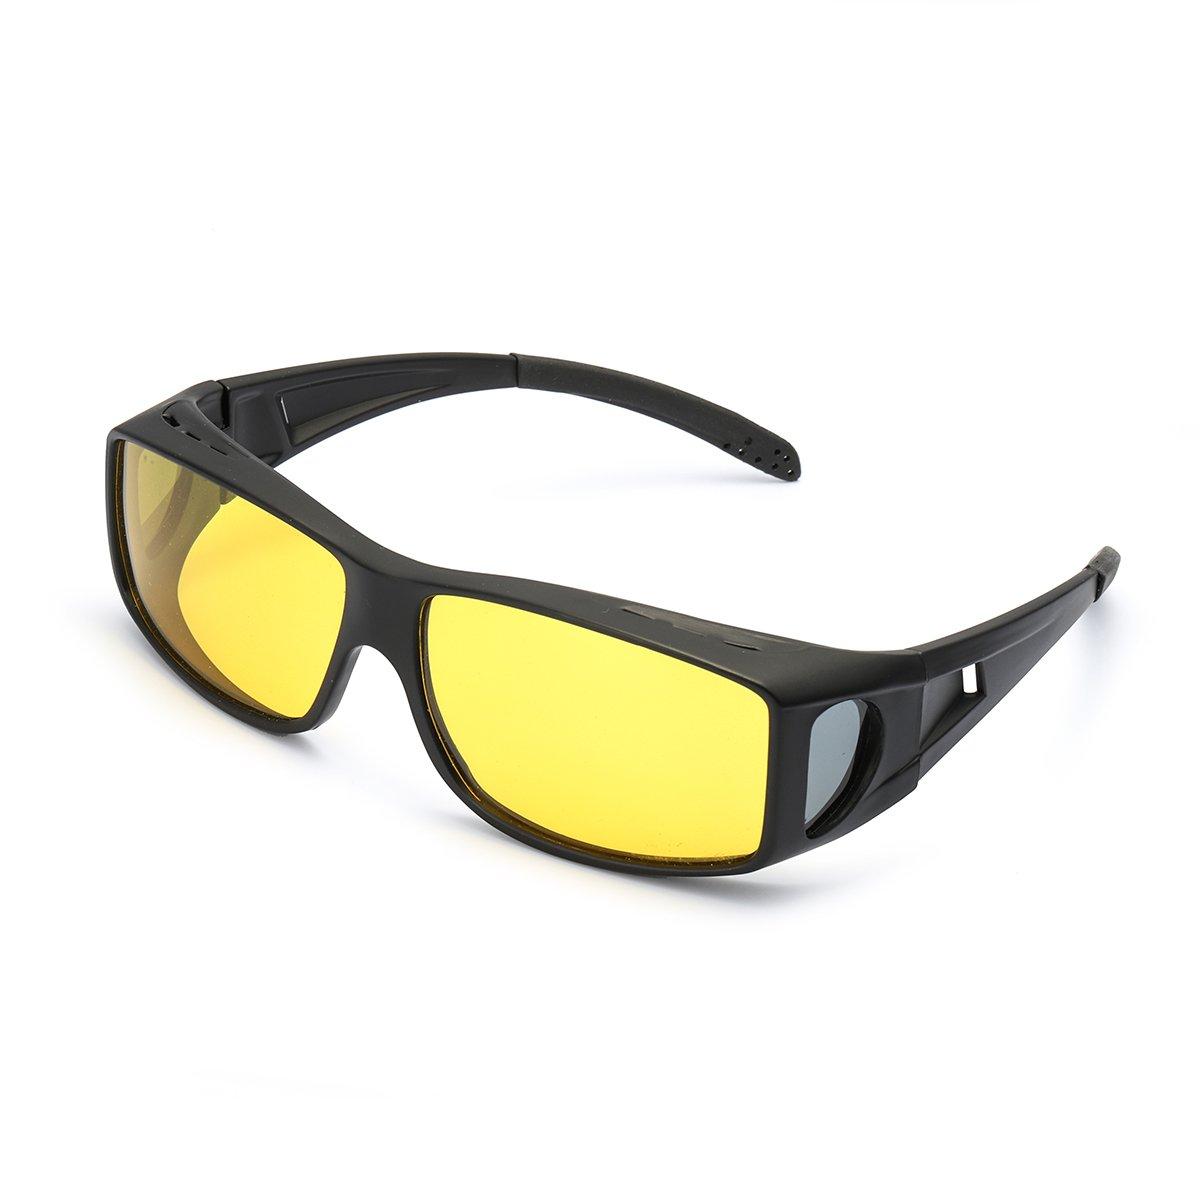 Wrap Around Style Polarized Night Driving Glasses to Wear Over Regular Prescription Glasses (Black, Yellow)